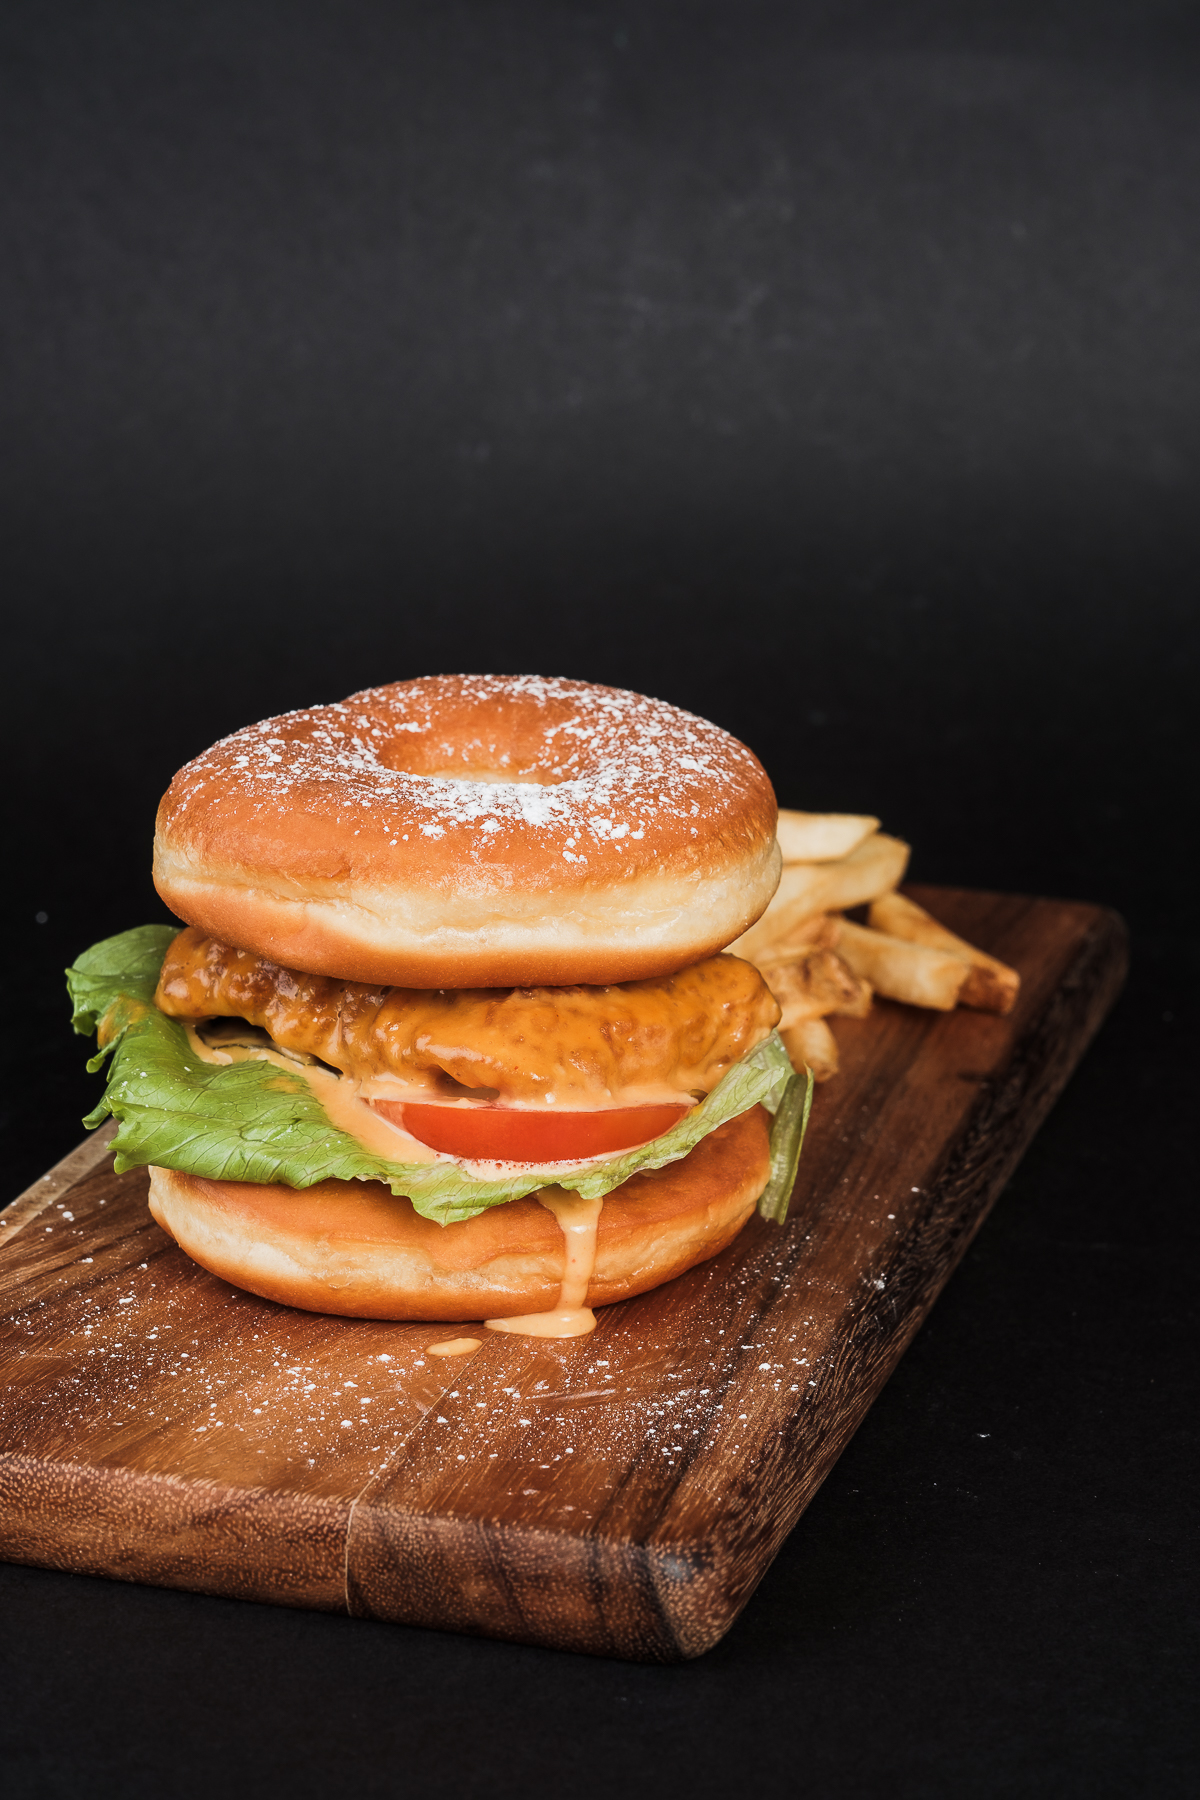 Chick Magnet (Salted Egg Katsu Chicken Burger)